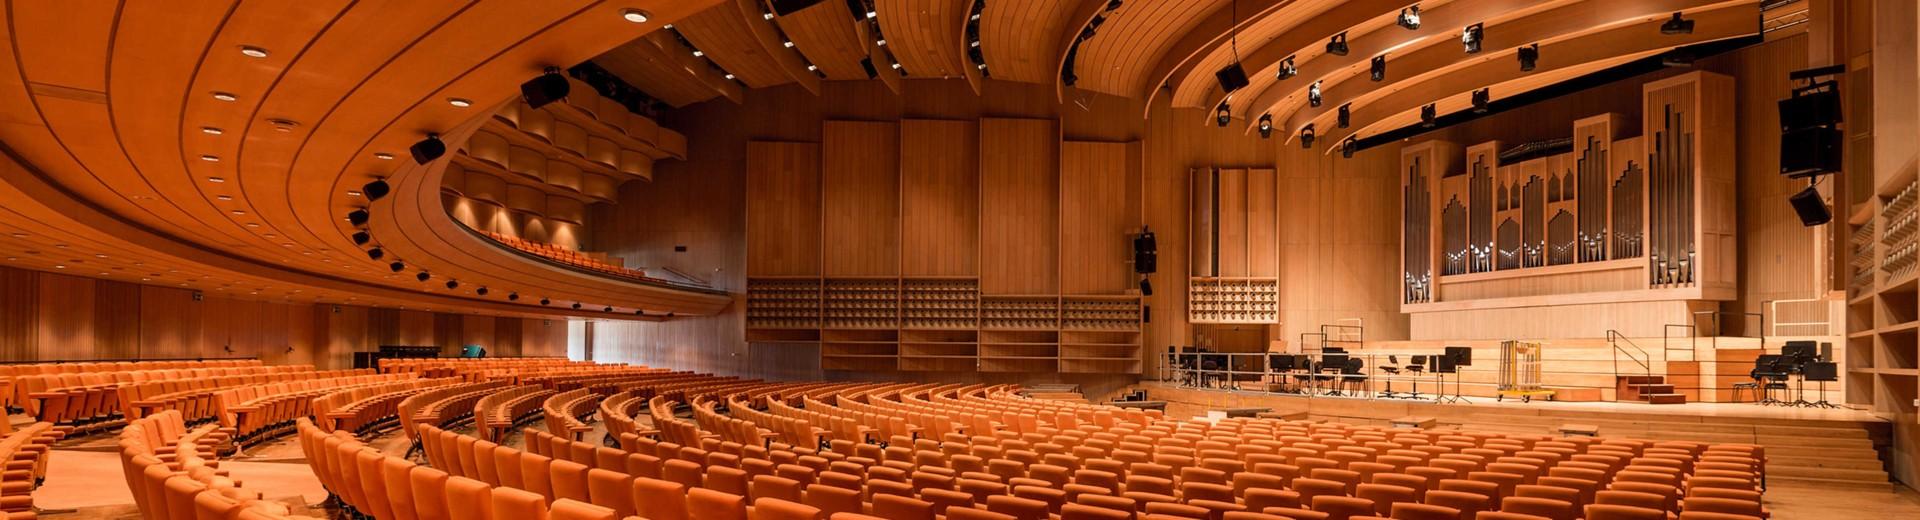 Brucknerhaus Linz - The Main Hall © Reinhard Winkler